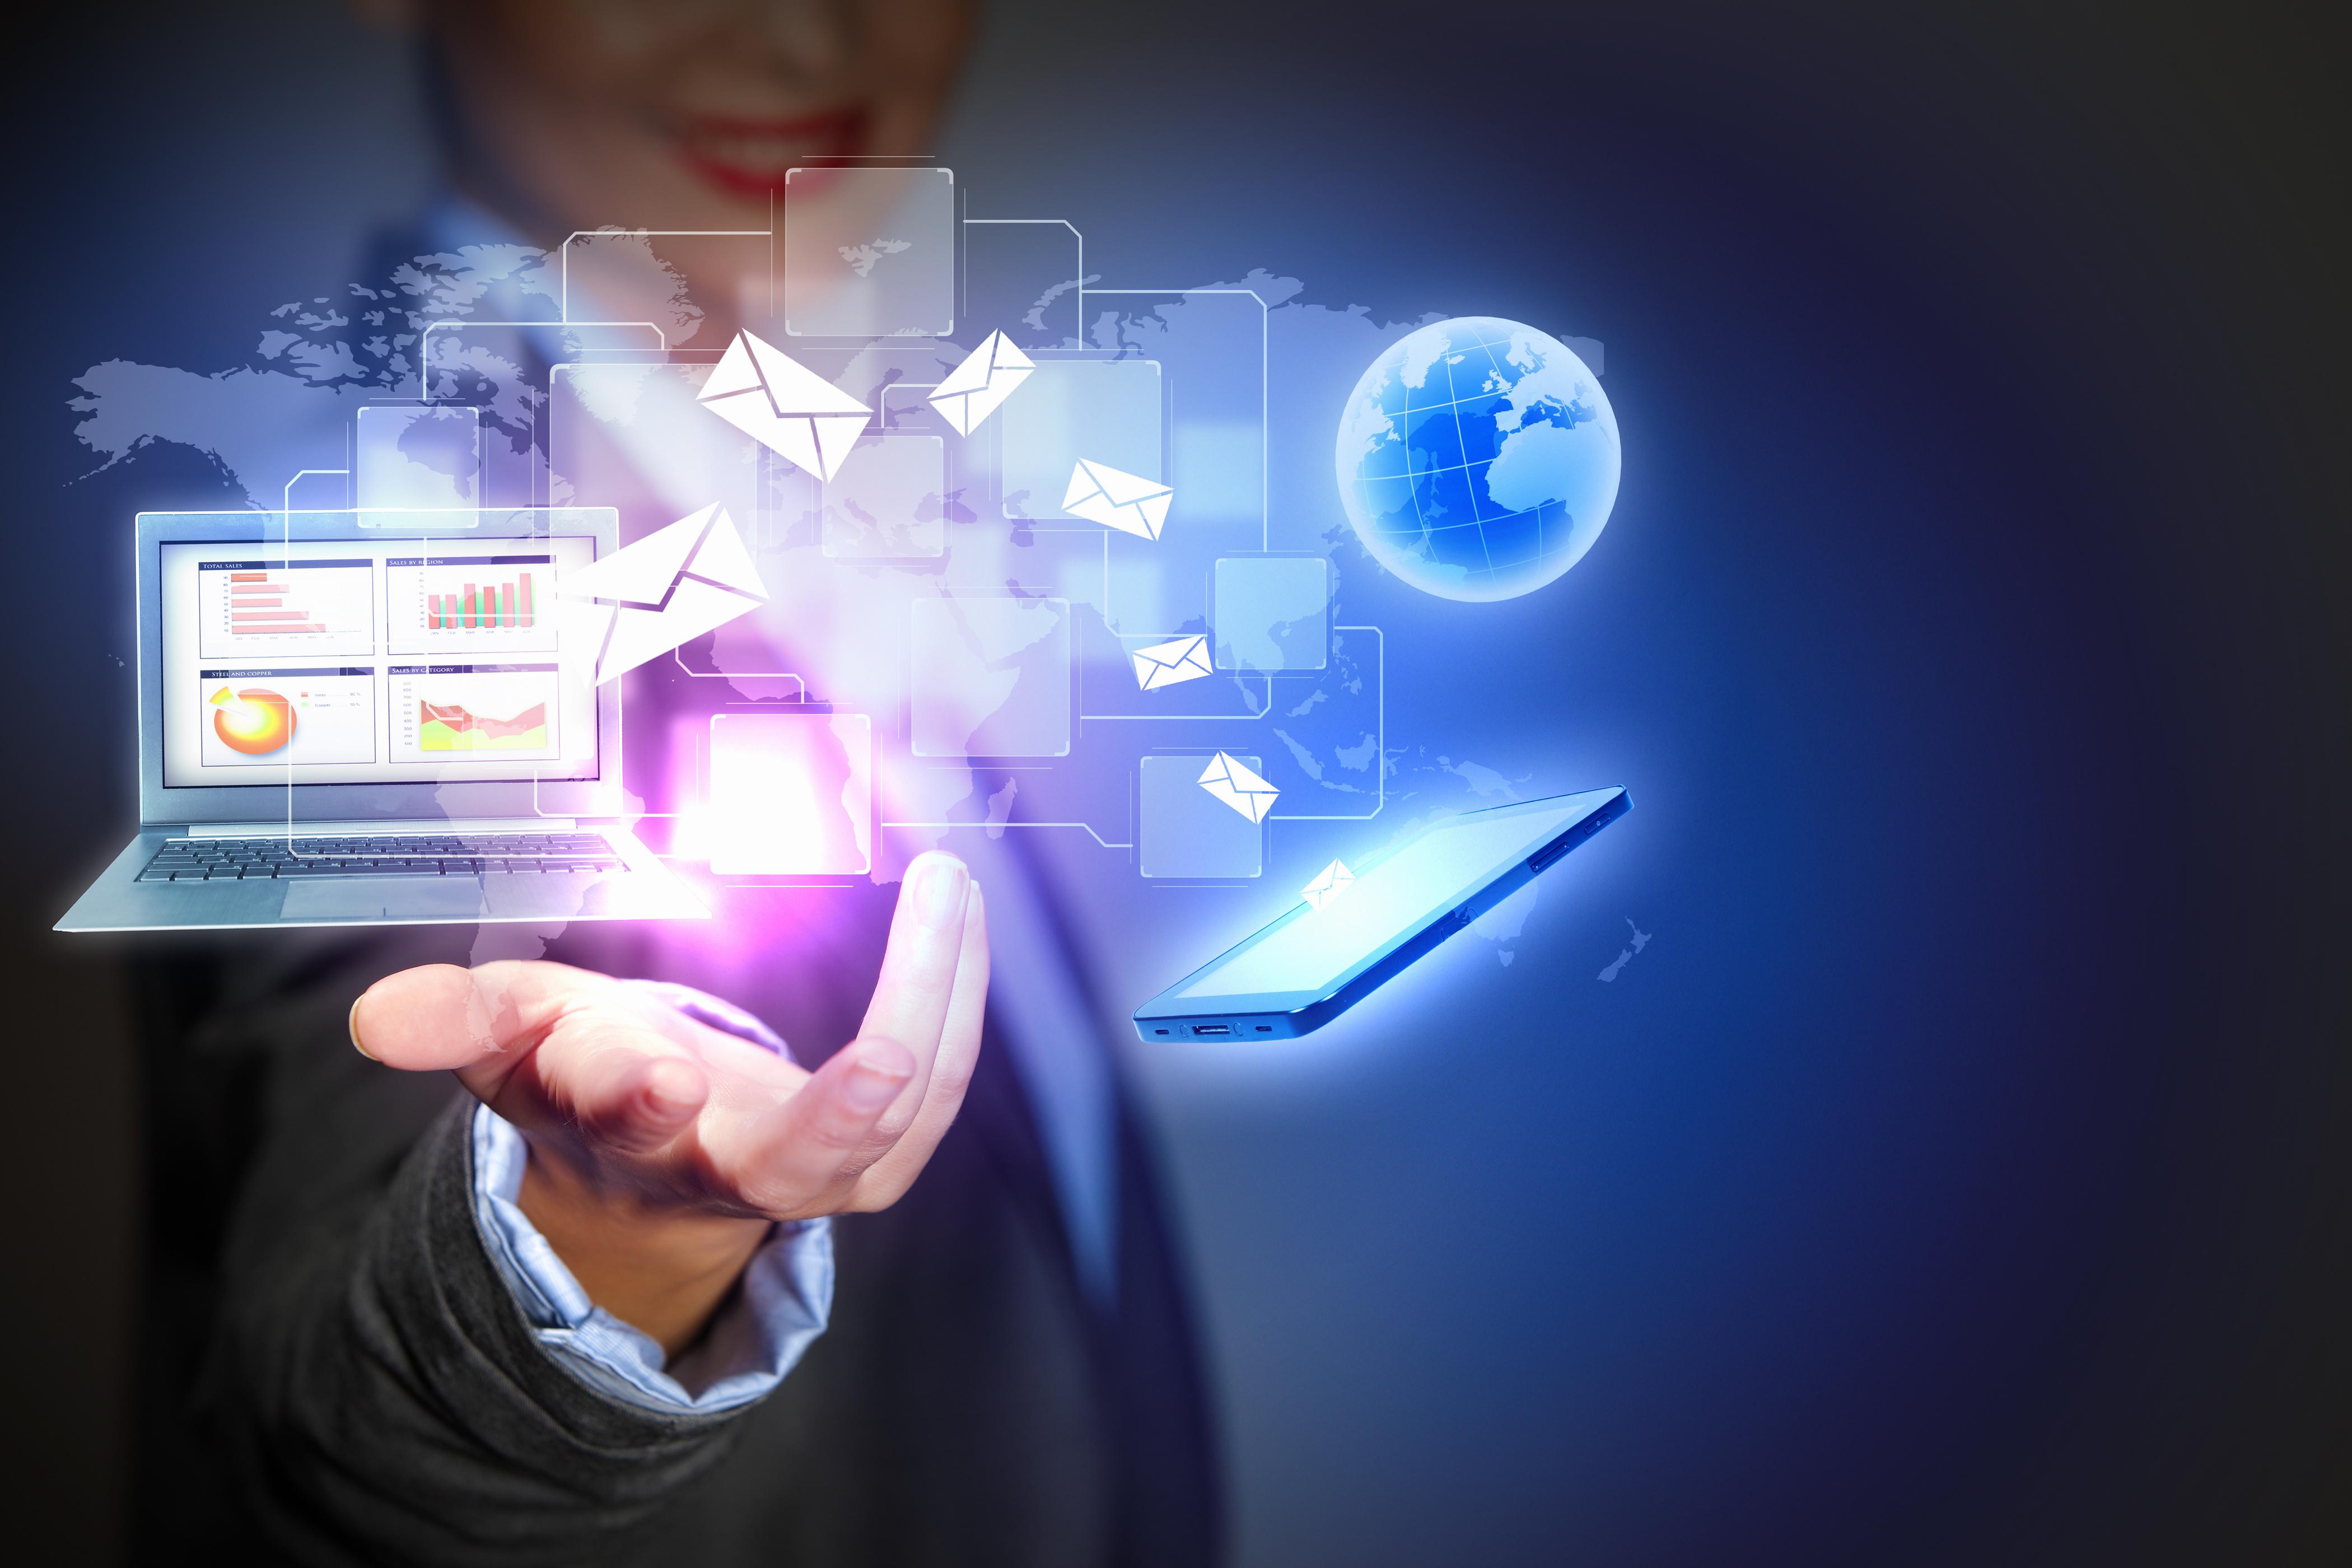 Fоrеx Trading Strategy - Autоmаtеd Fоrеx Trаding Systems